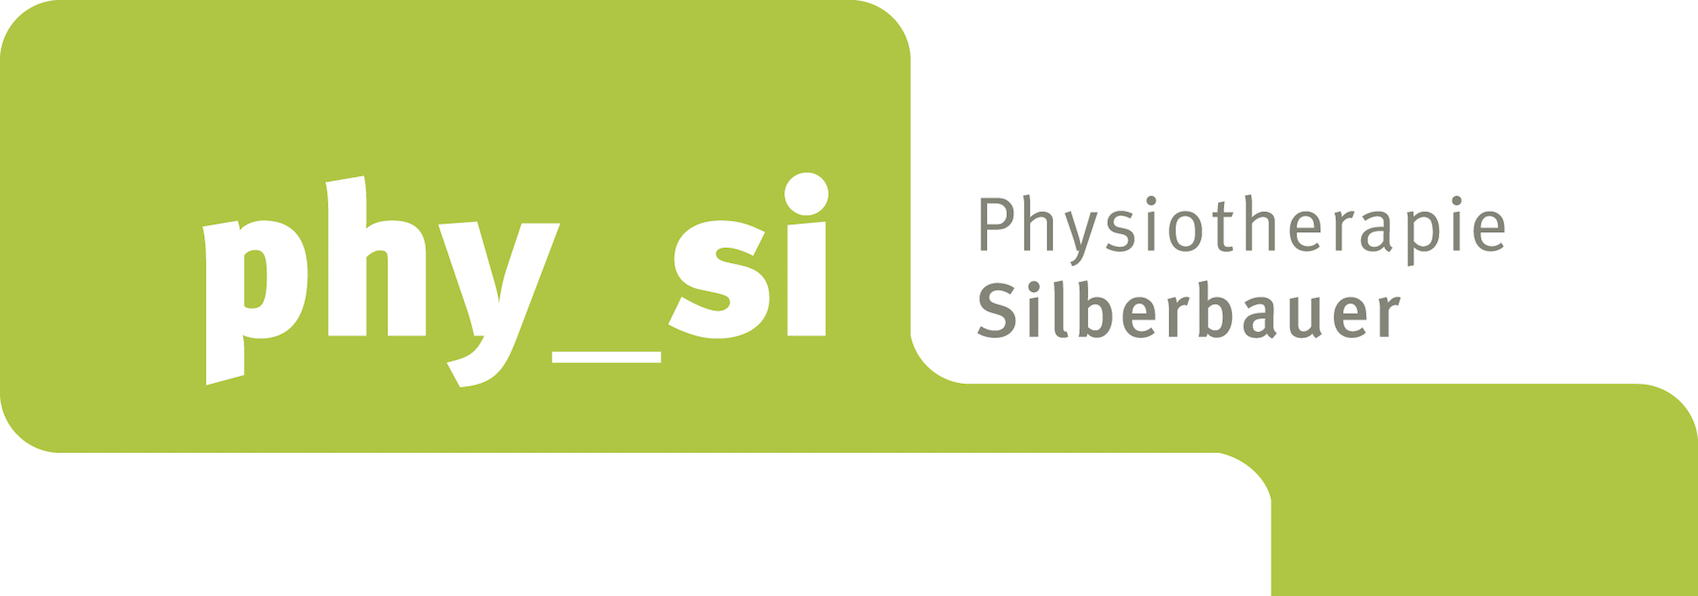 phy_si_logo_HSV